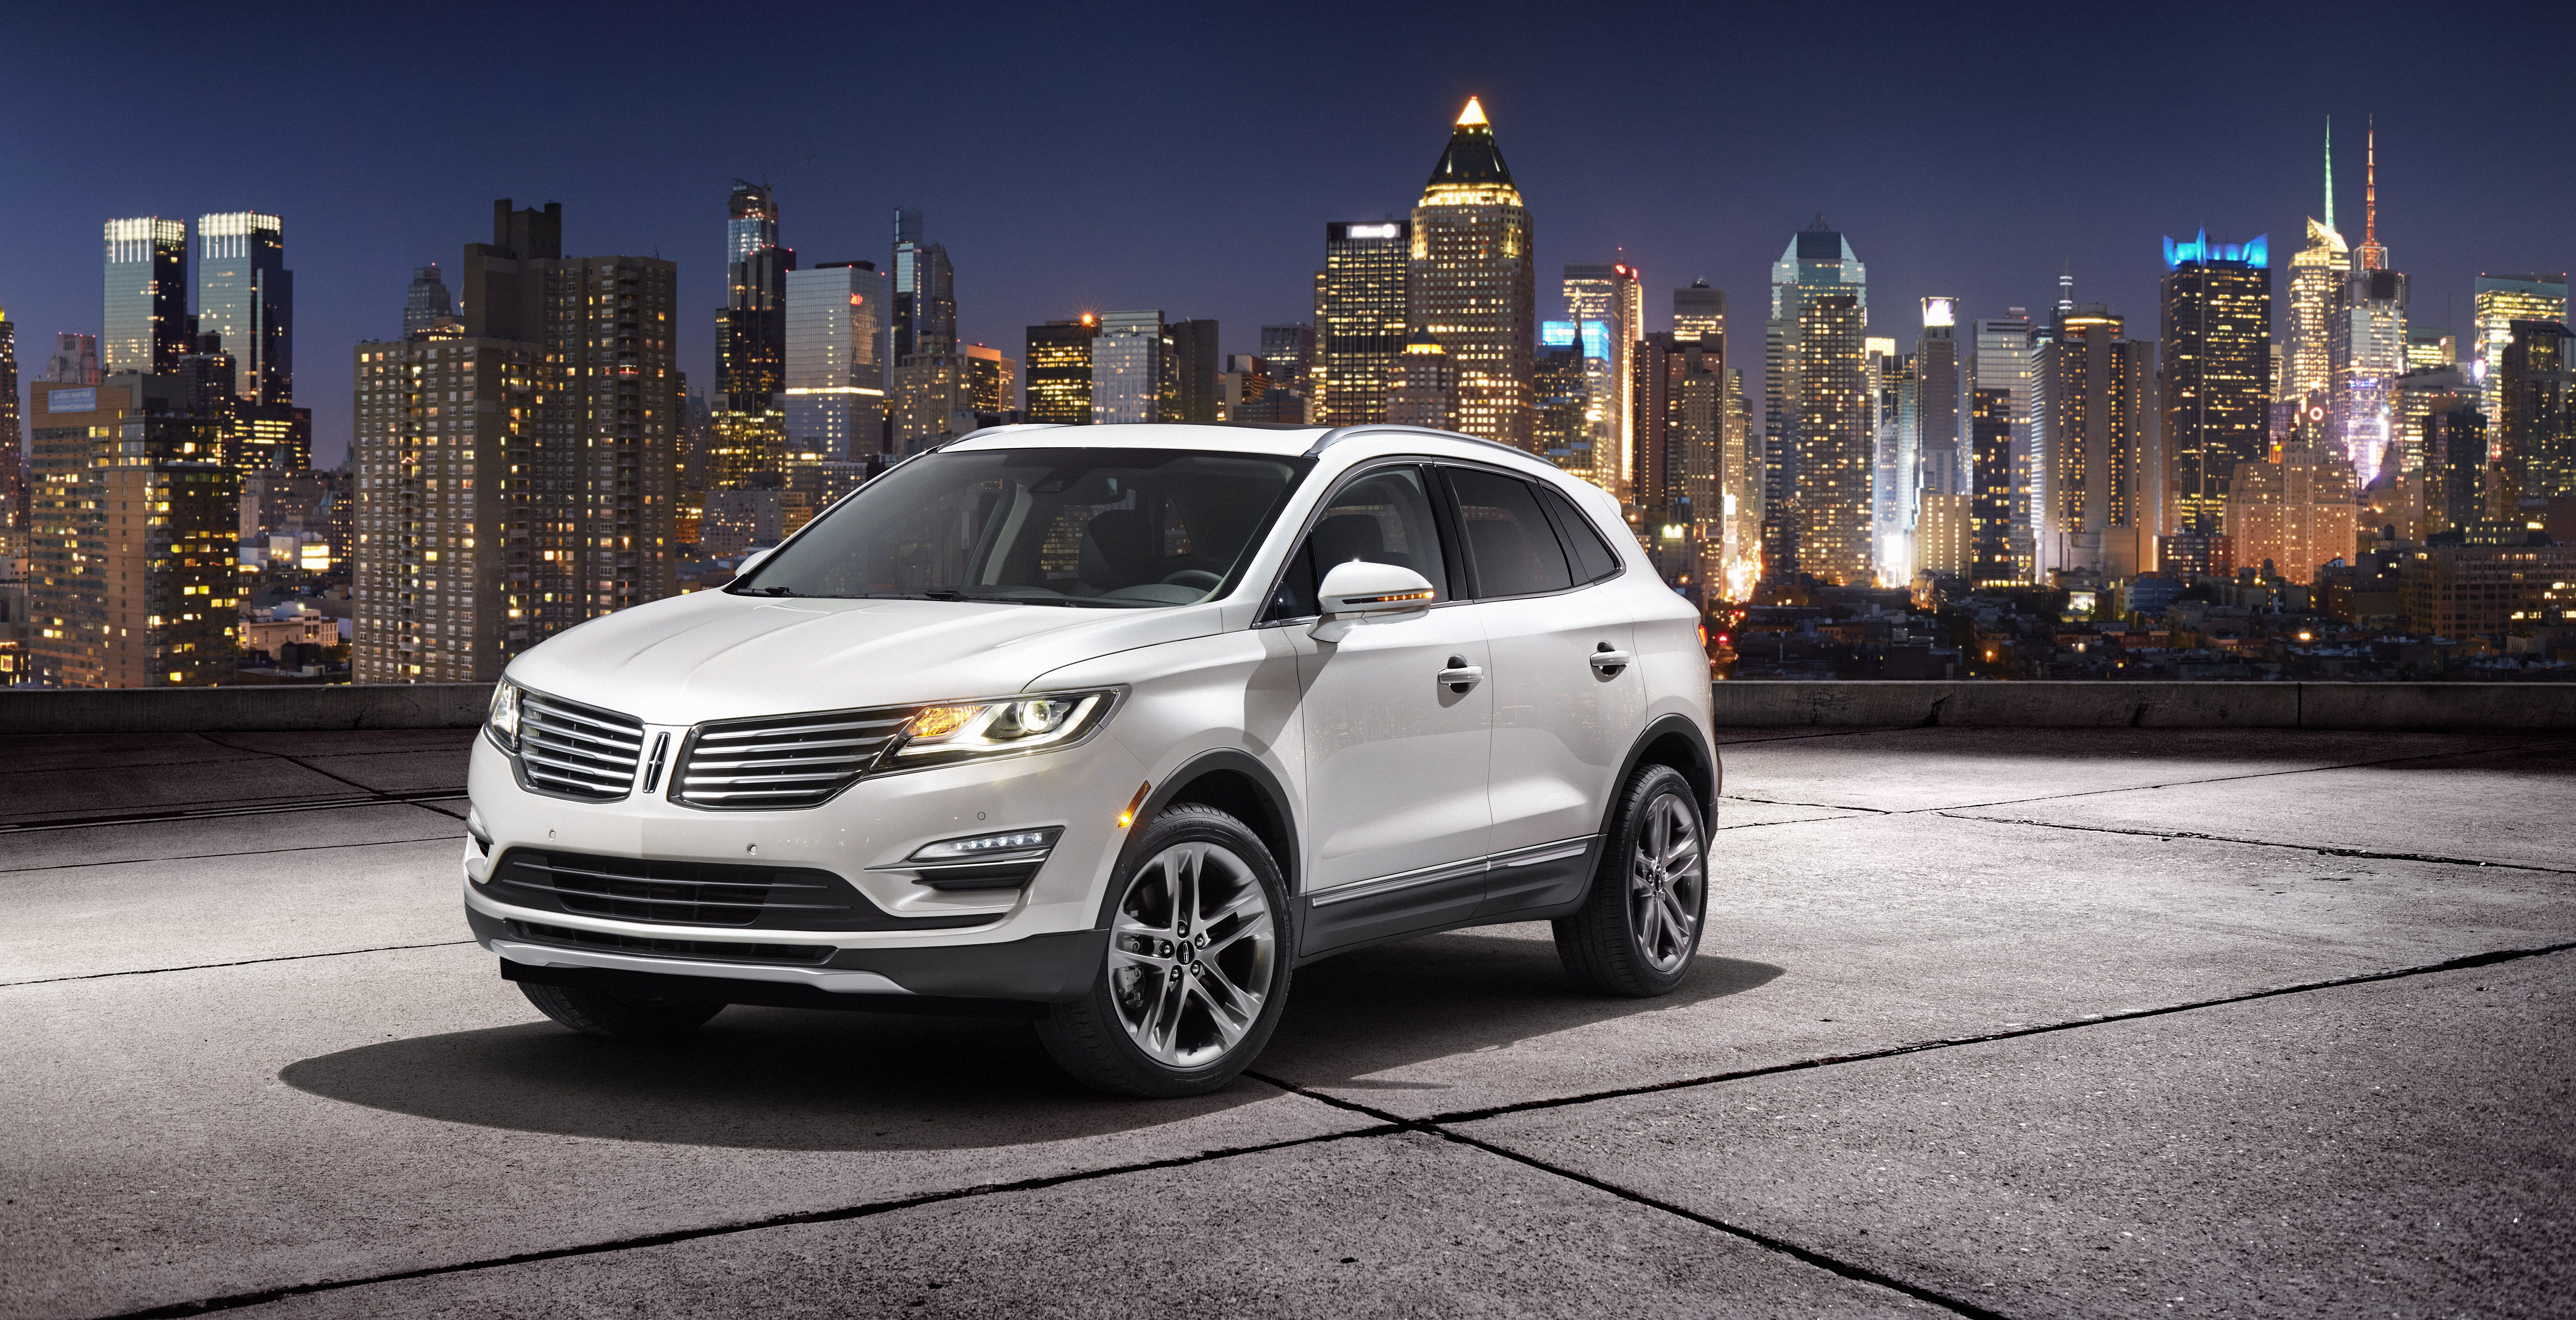 Lincoln Motor Company >> Lincoln Motor Company Introduces Sporty New 2015 Mkc In New York